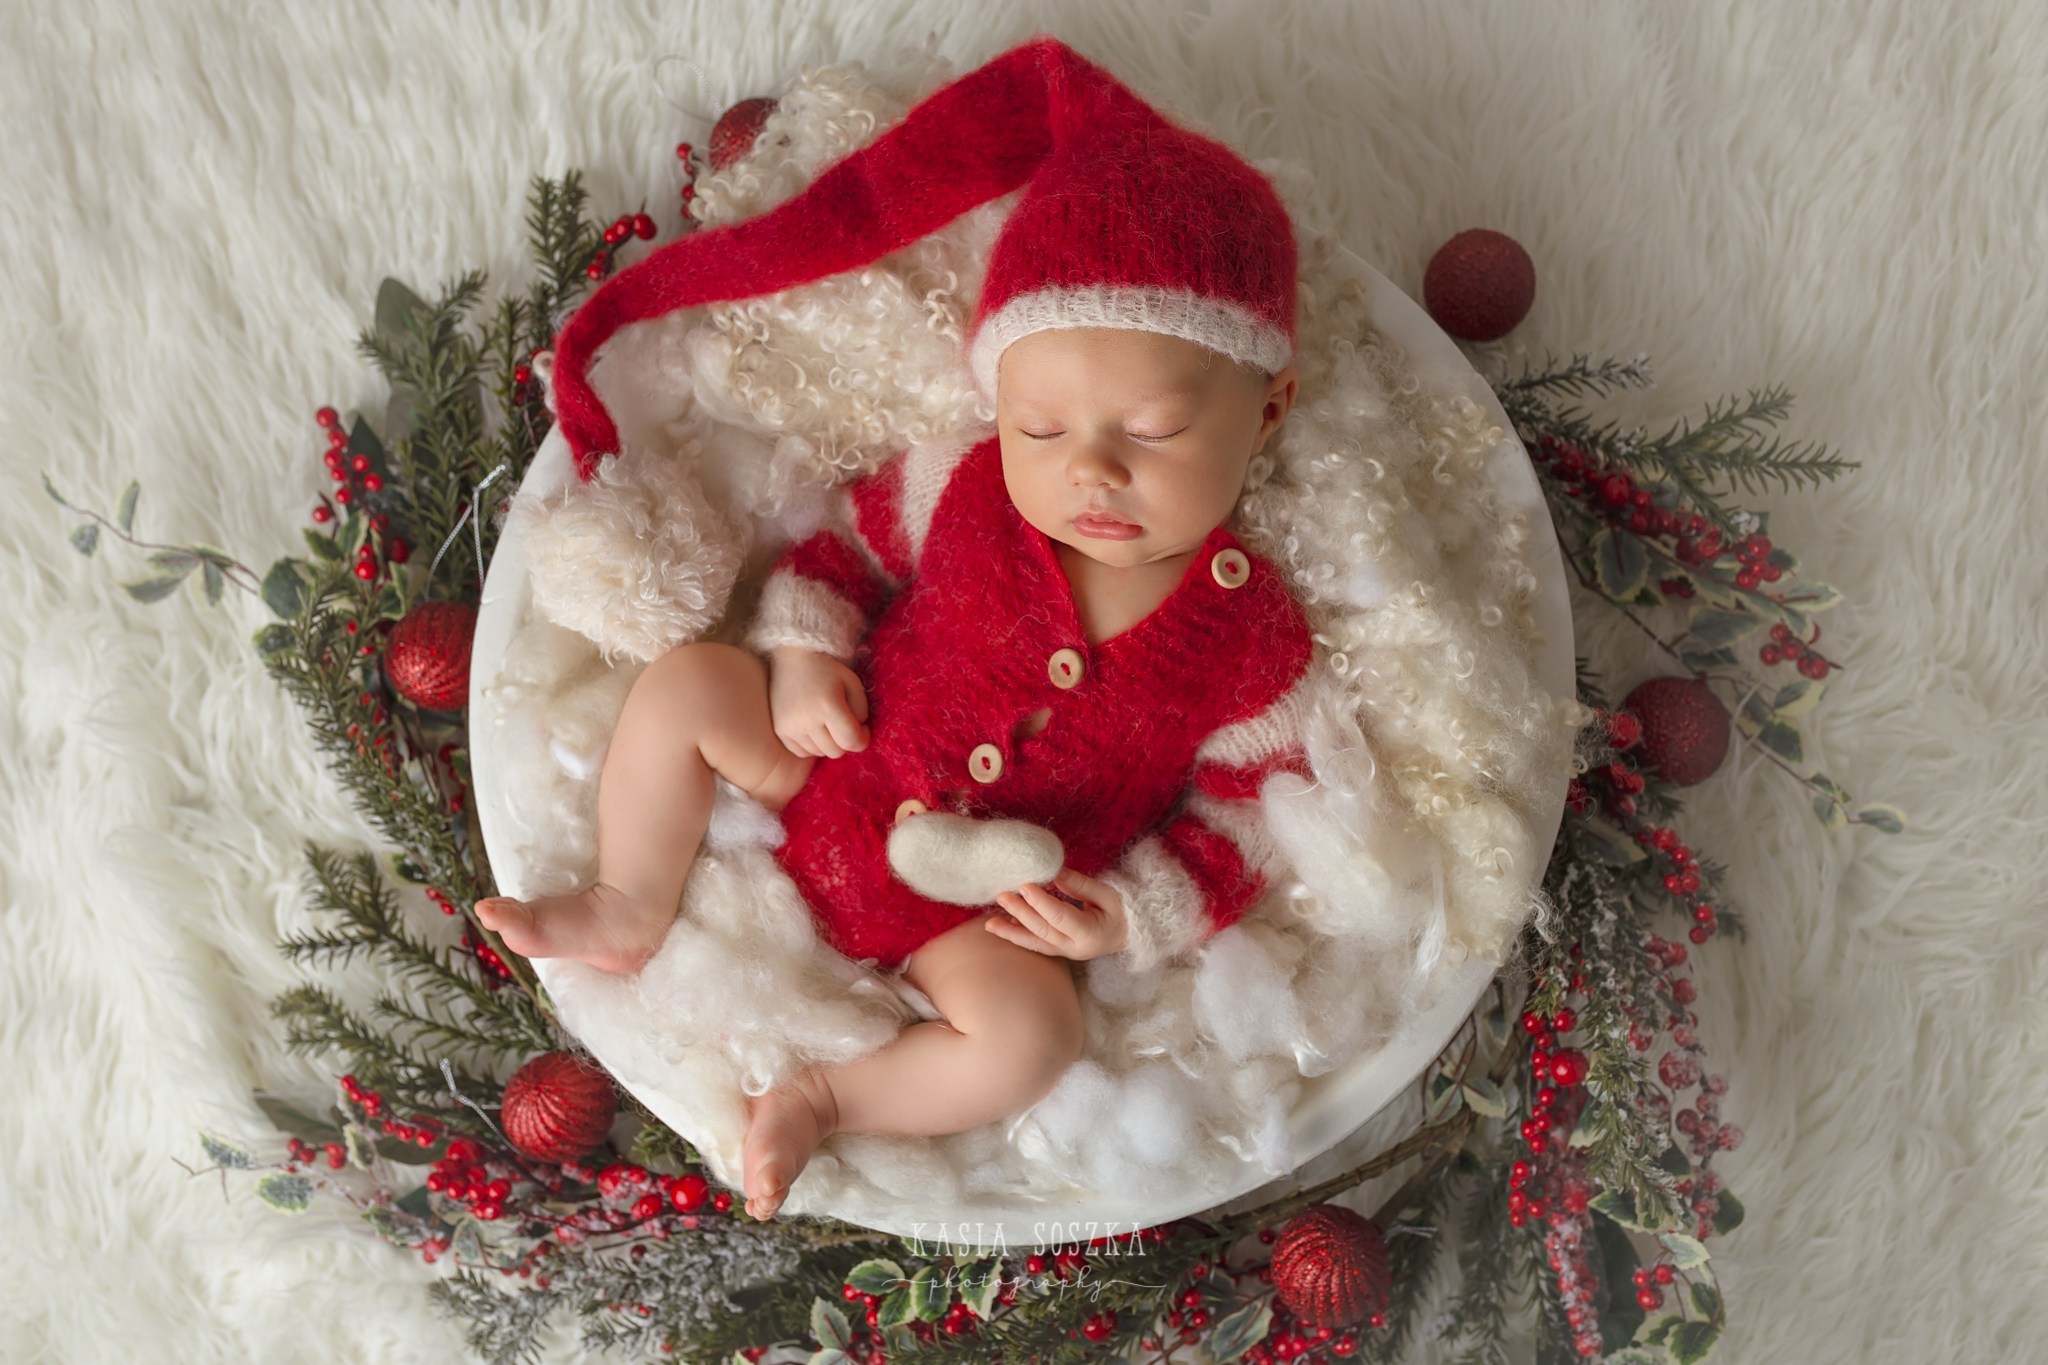 Newborn photography Leeds-York-Bradford-Harrogate: Christmas newborn session in Leeds, Yorkshire. Cute newborn baby girl in Santa Claus outfit